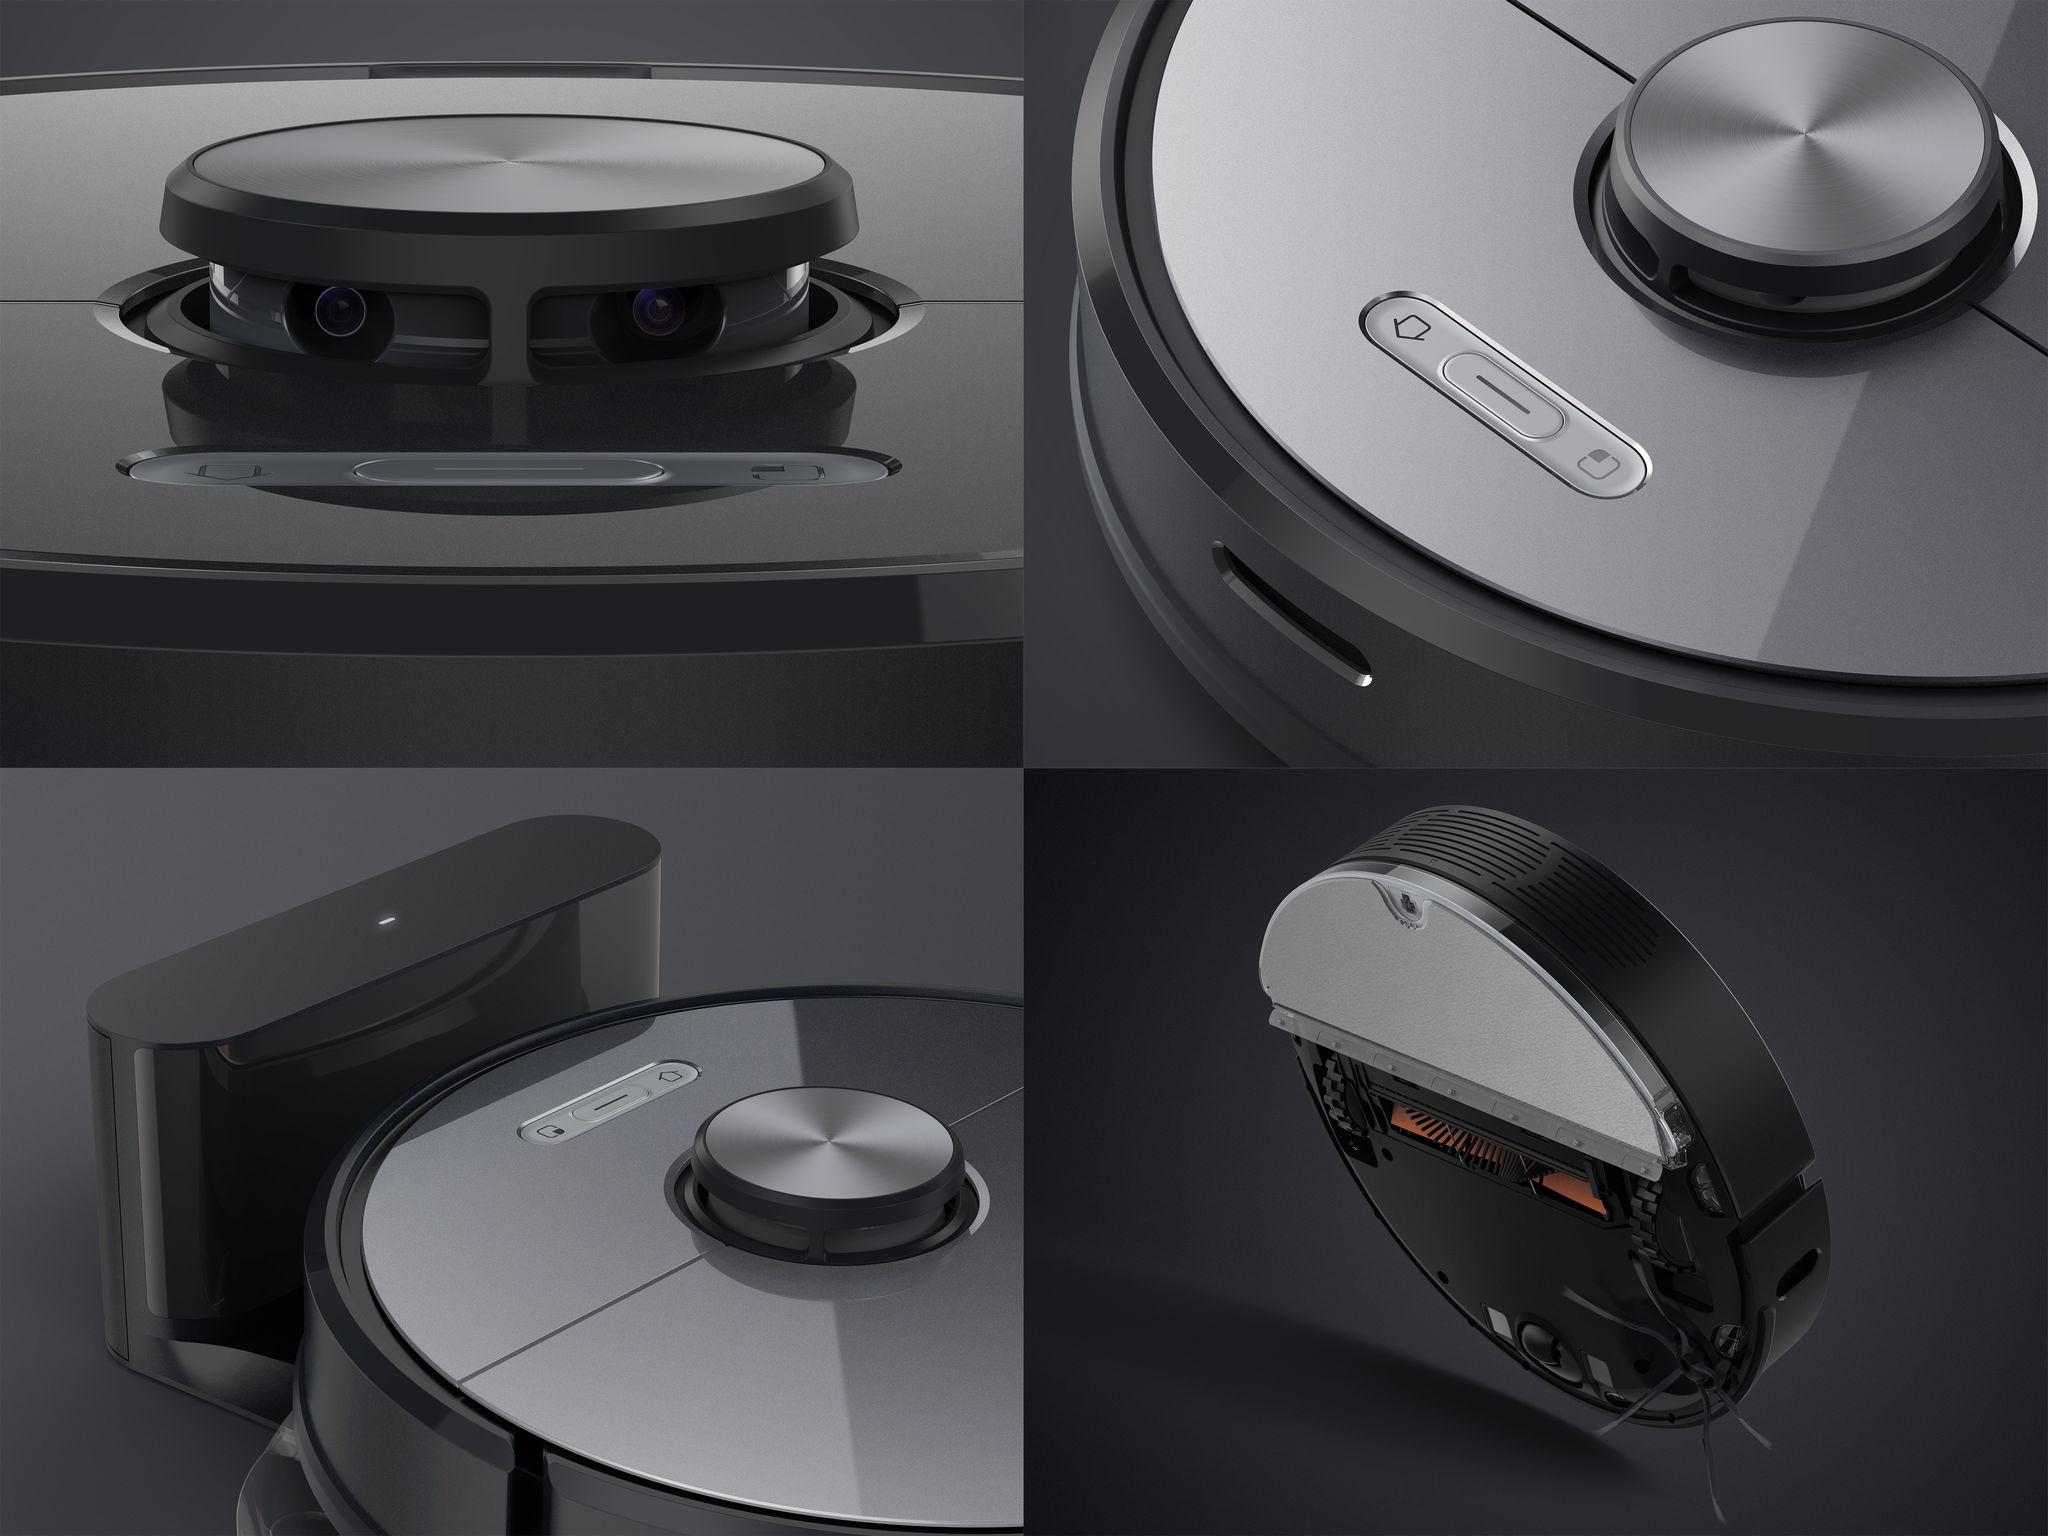 جارو رباتیک شیائومی RoboRock Vacuum Cleaner S6